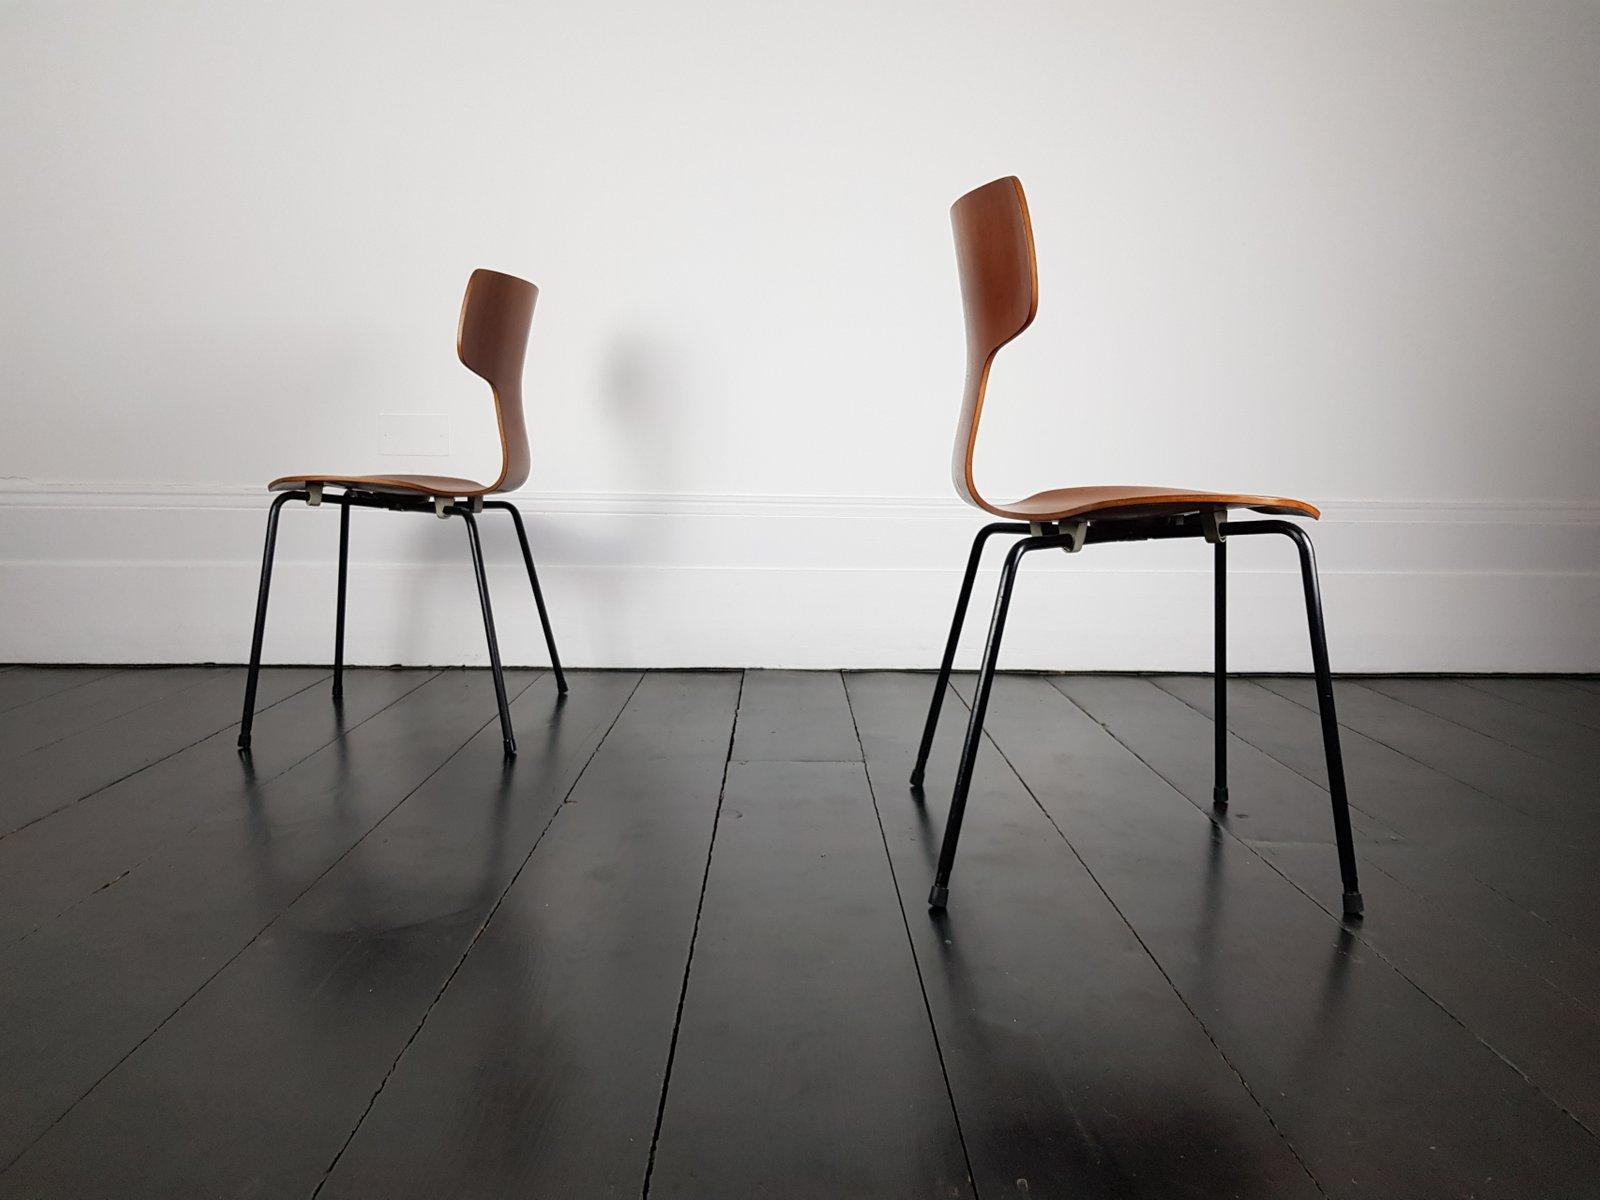 modell 3103 hammer st hle von arne jacobsen f r fritz hansen 1960er 2er set bei pamono kaufen. Black Bedroom Furniture Sets. Home Design Ideas